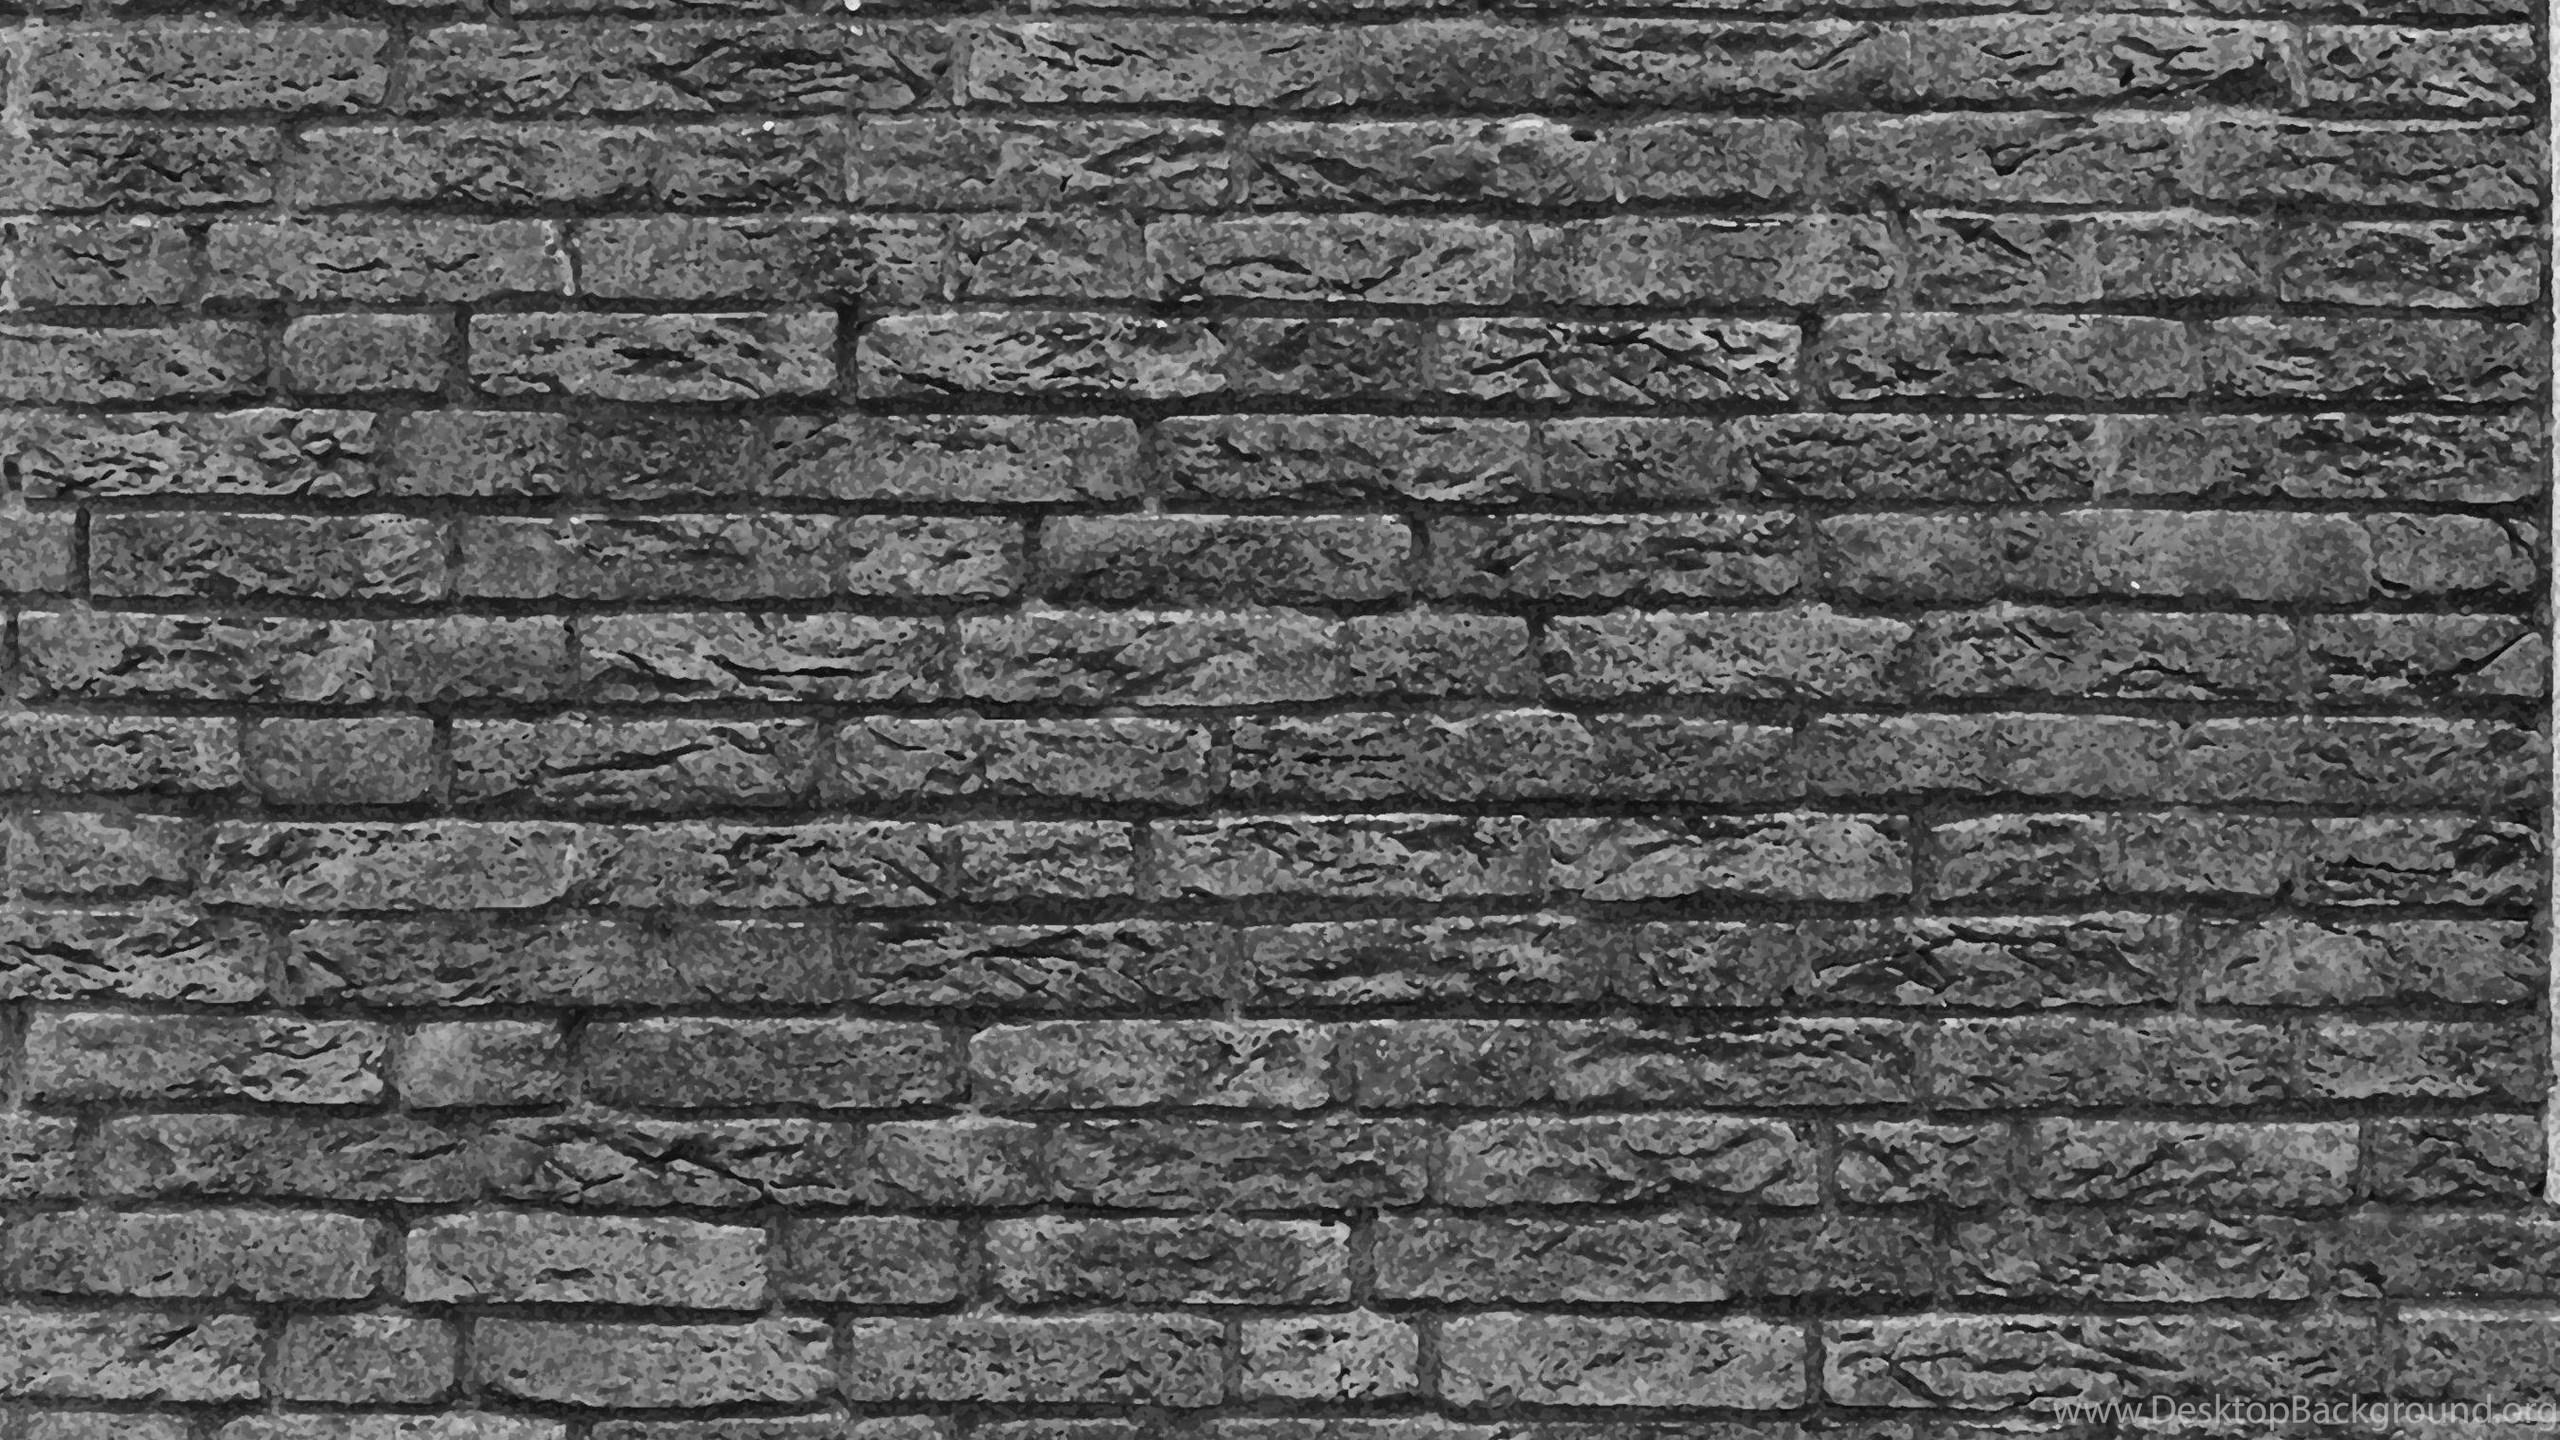 brick wall black and white in photoshop 2016 white brick